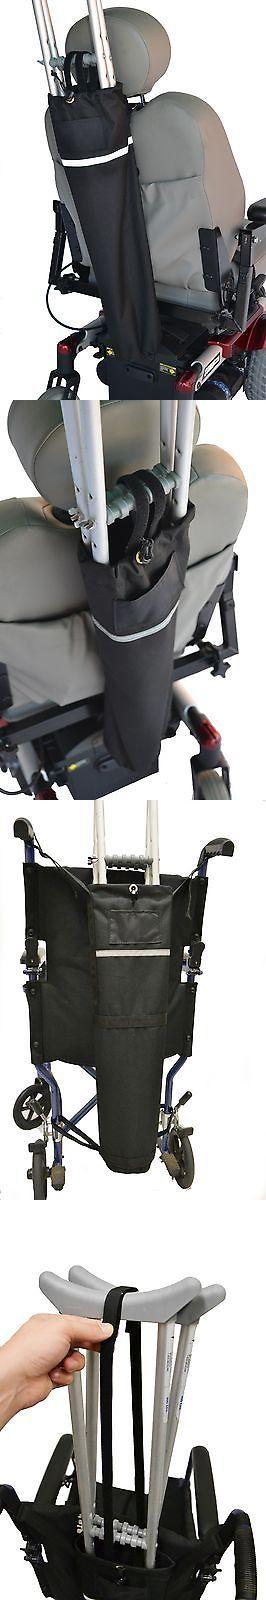 crutch holder for manual wheelchair